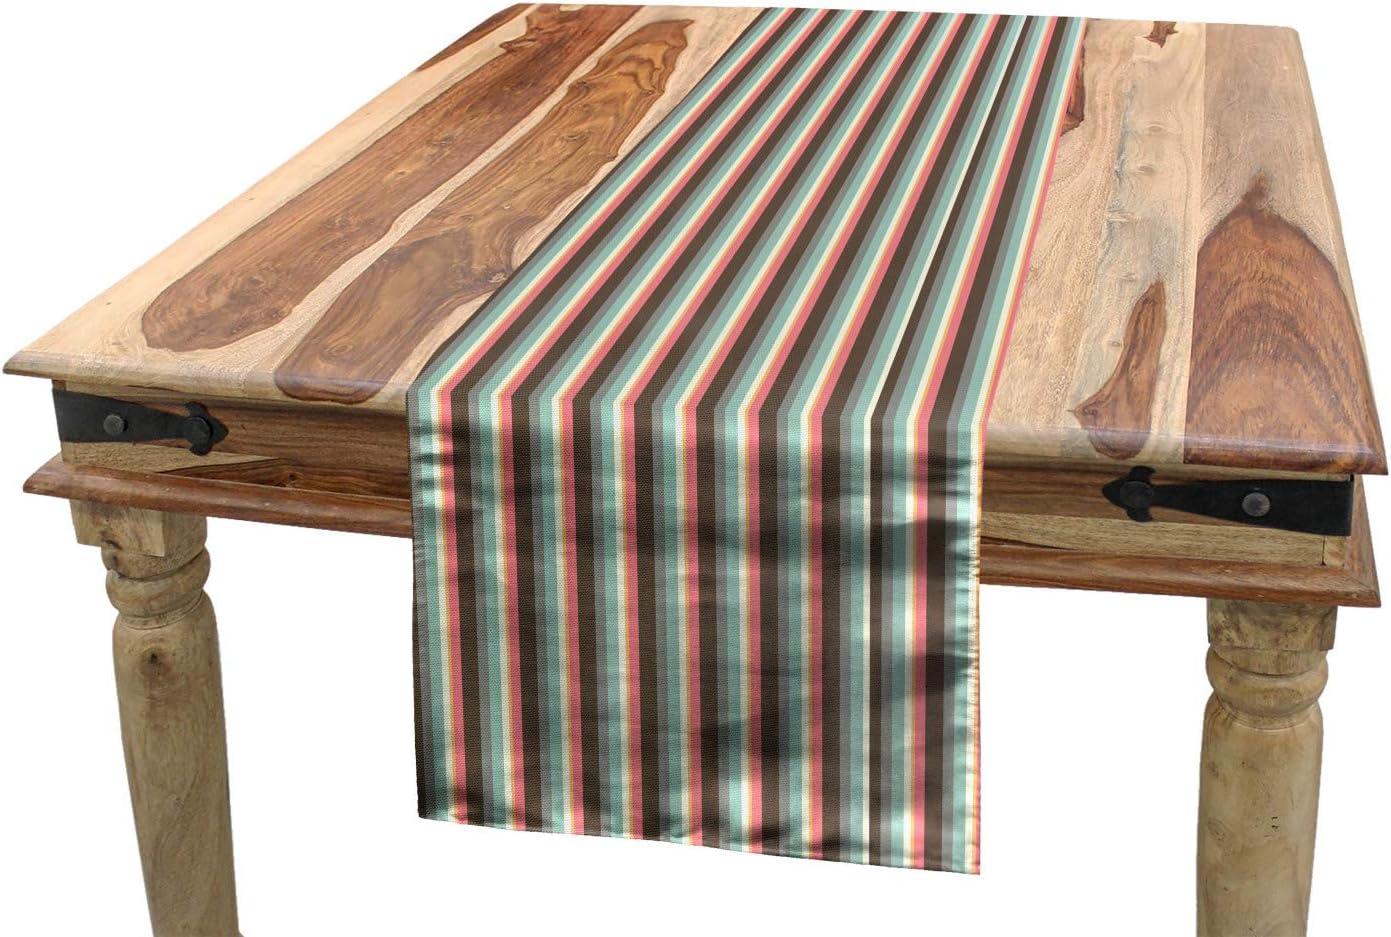 Amazon.com: Lunarable Striped Table Runner, Retro Vertical Lines